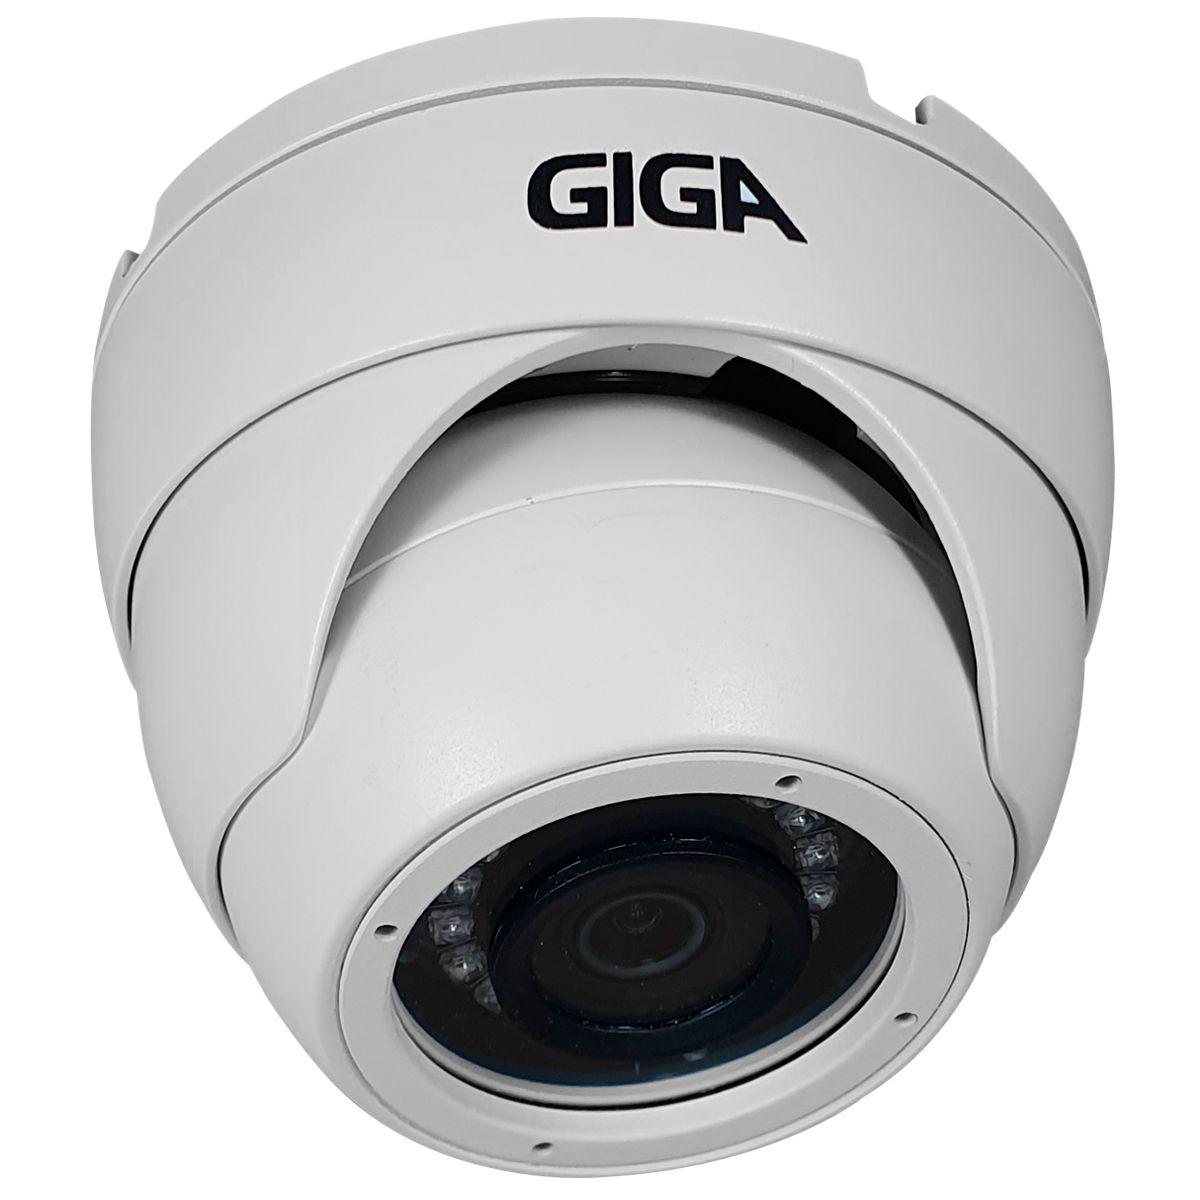 camera-full-hd-giga-security-gs0272-orion-2mp-30-metros